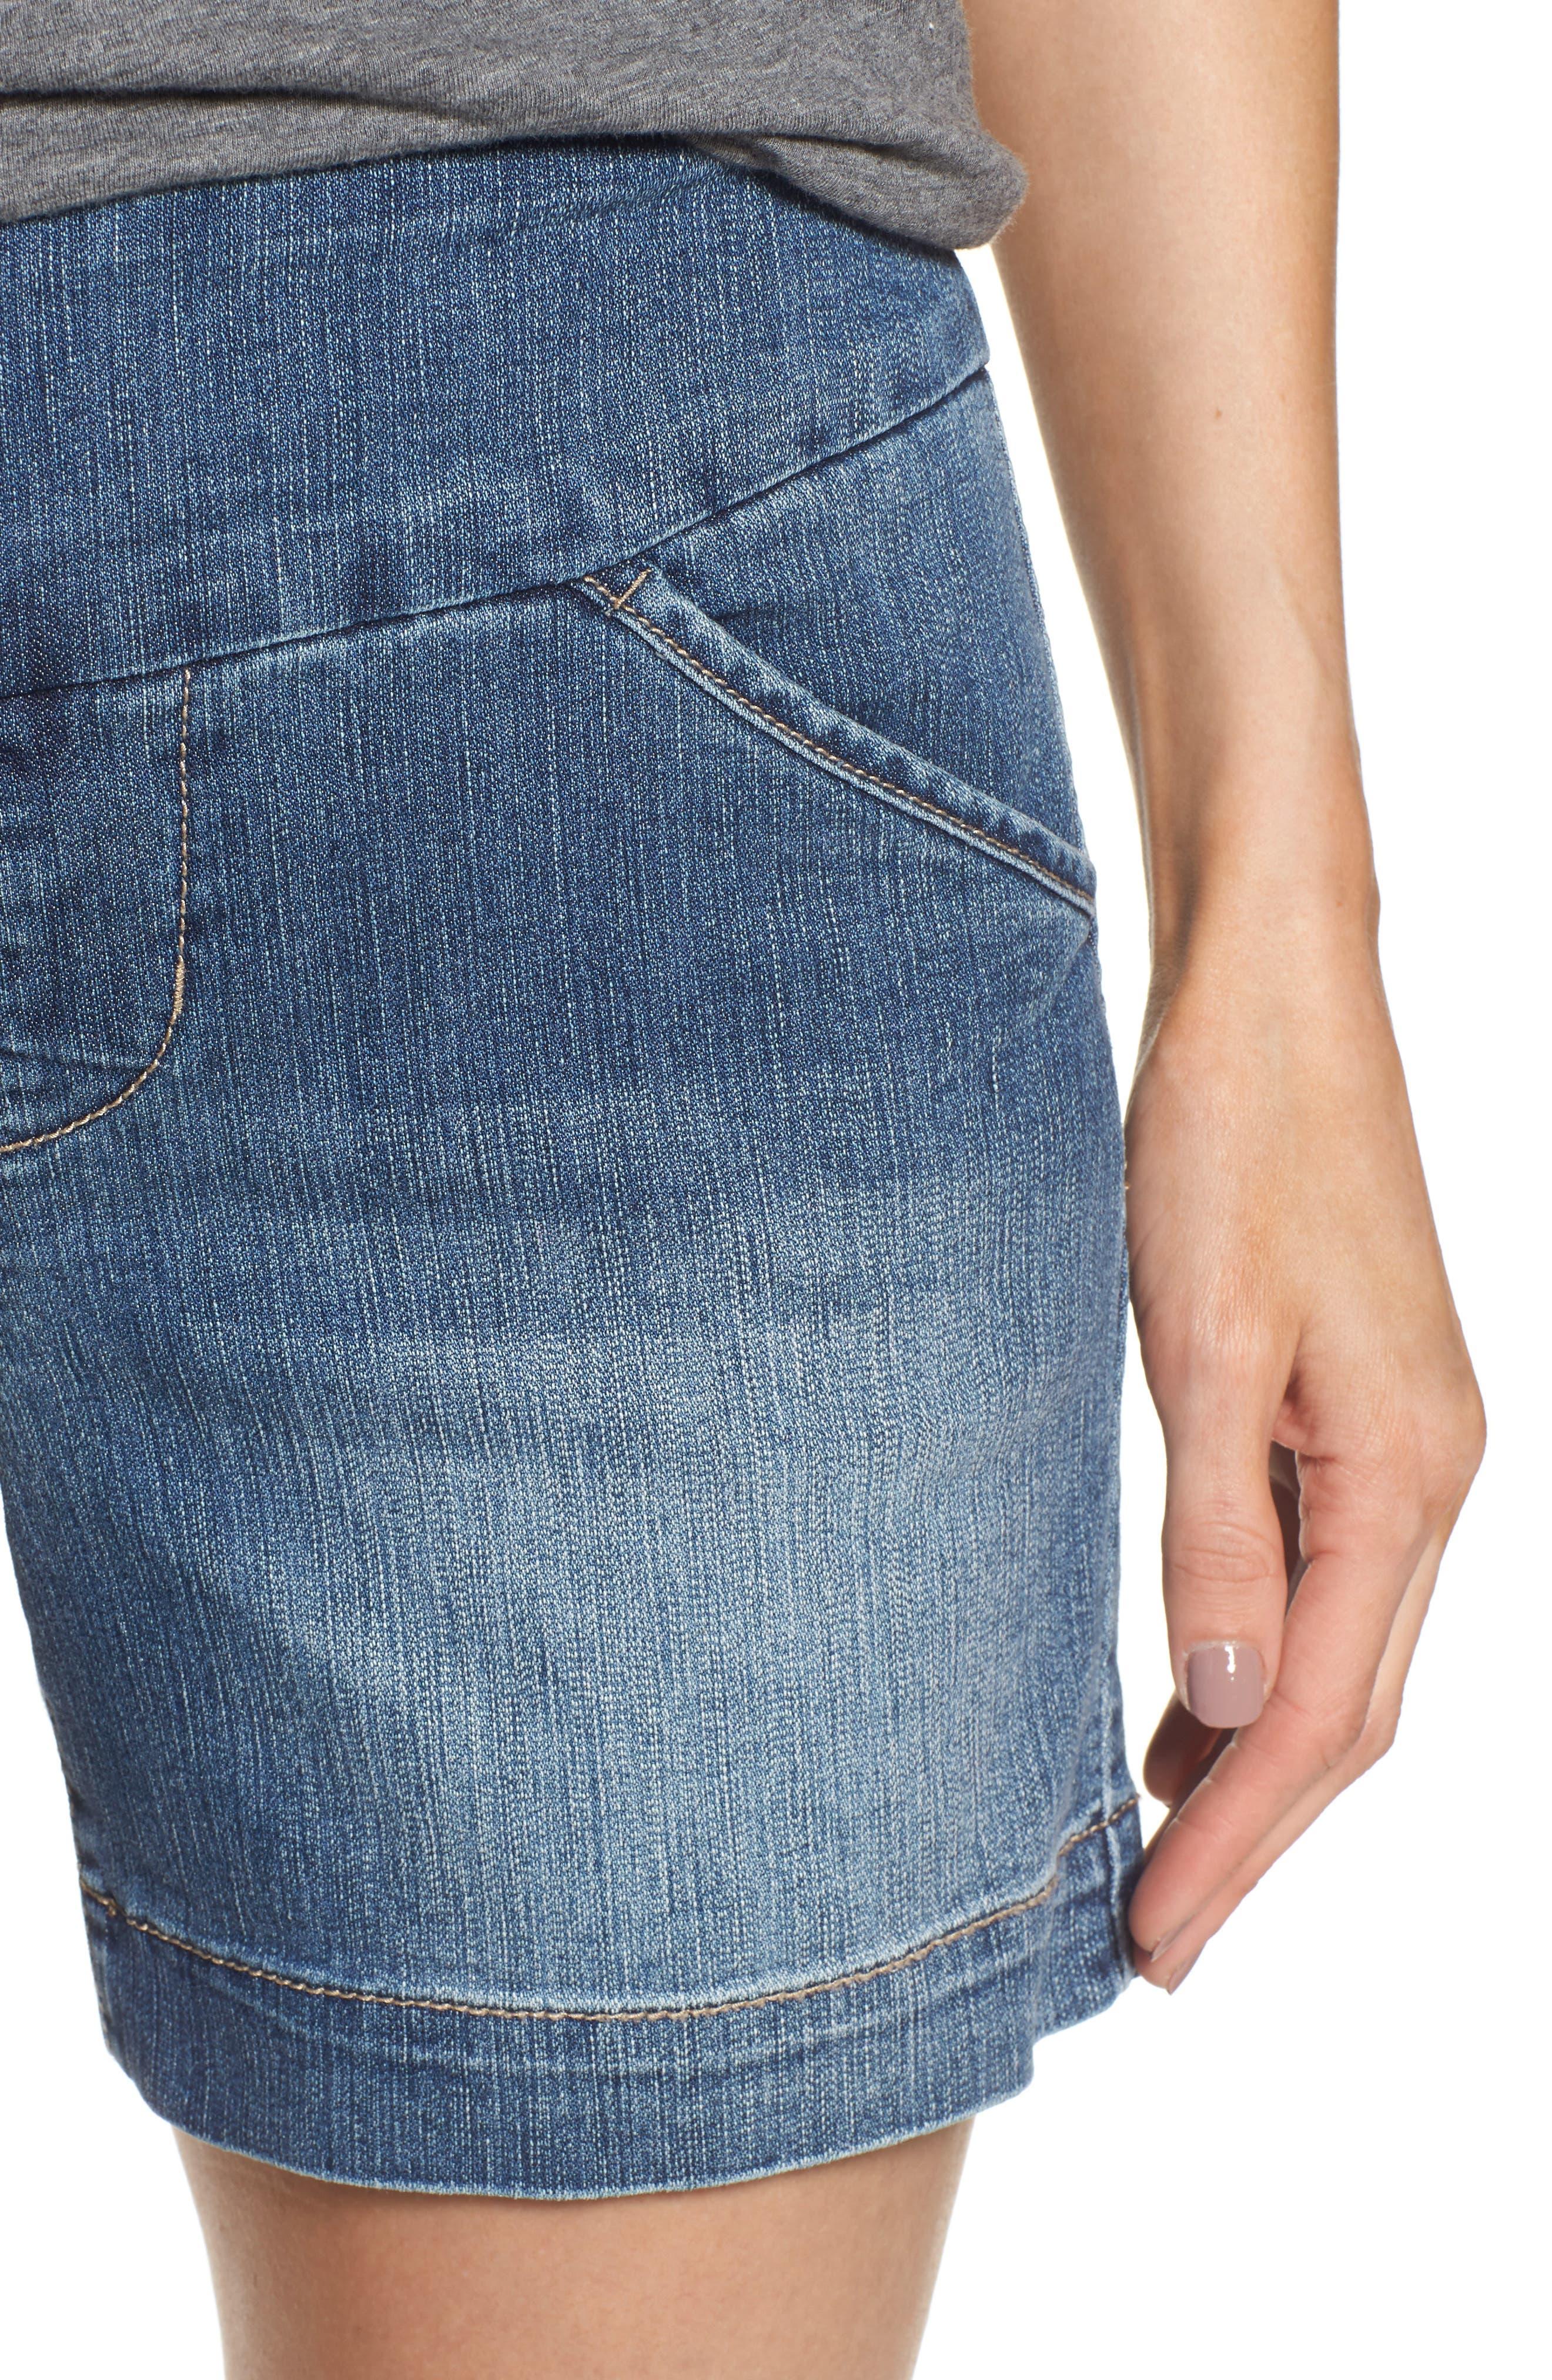 Ainsley Pull-On Denim Shorts,                             Alternate thumbnail 4, color,                             402